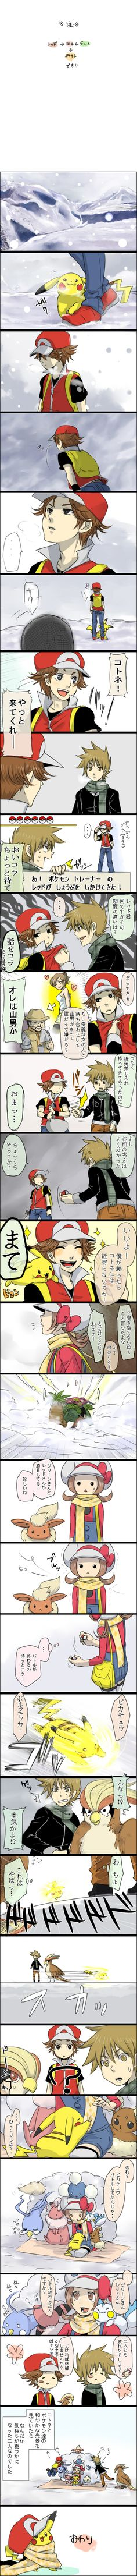 Fire (Pokémon), Green (Pokémon), Pikachu, Rosa/Kotone (Pokémon), ... (by Sakurai, Pixiv Id 1364648)